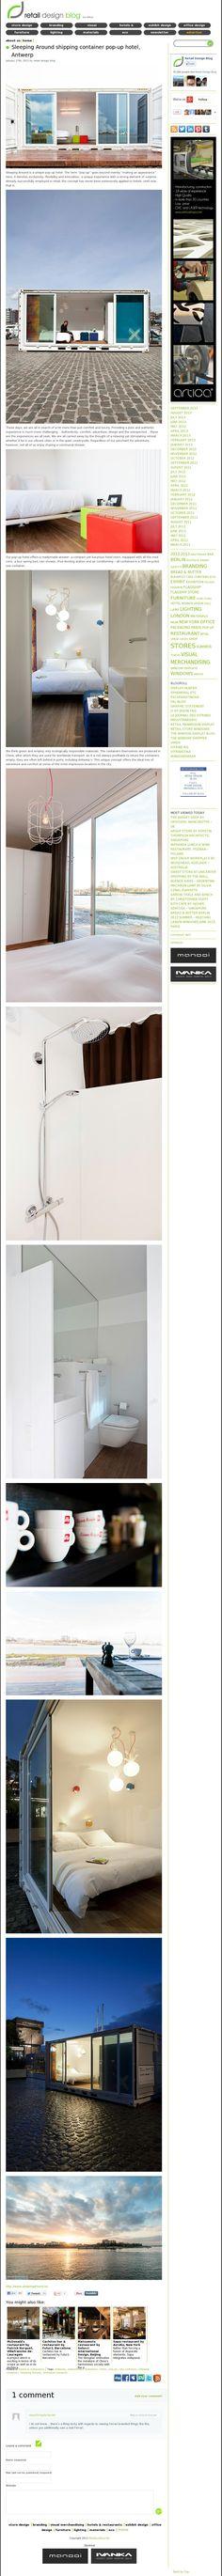 The website 'http://retaildesignblog.net/2013/01/27/sleeping-around-shipping-container-pop-up-hotel-antwerp/' courtesy of @Pinstamatic (http://pinstamatic.com)